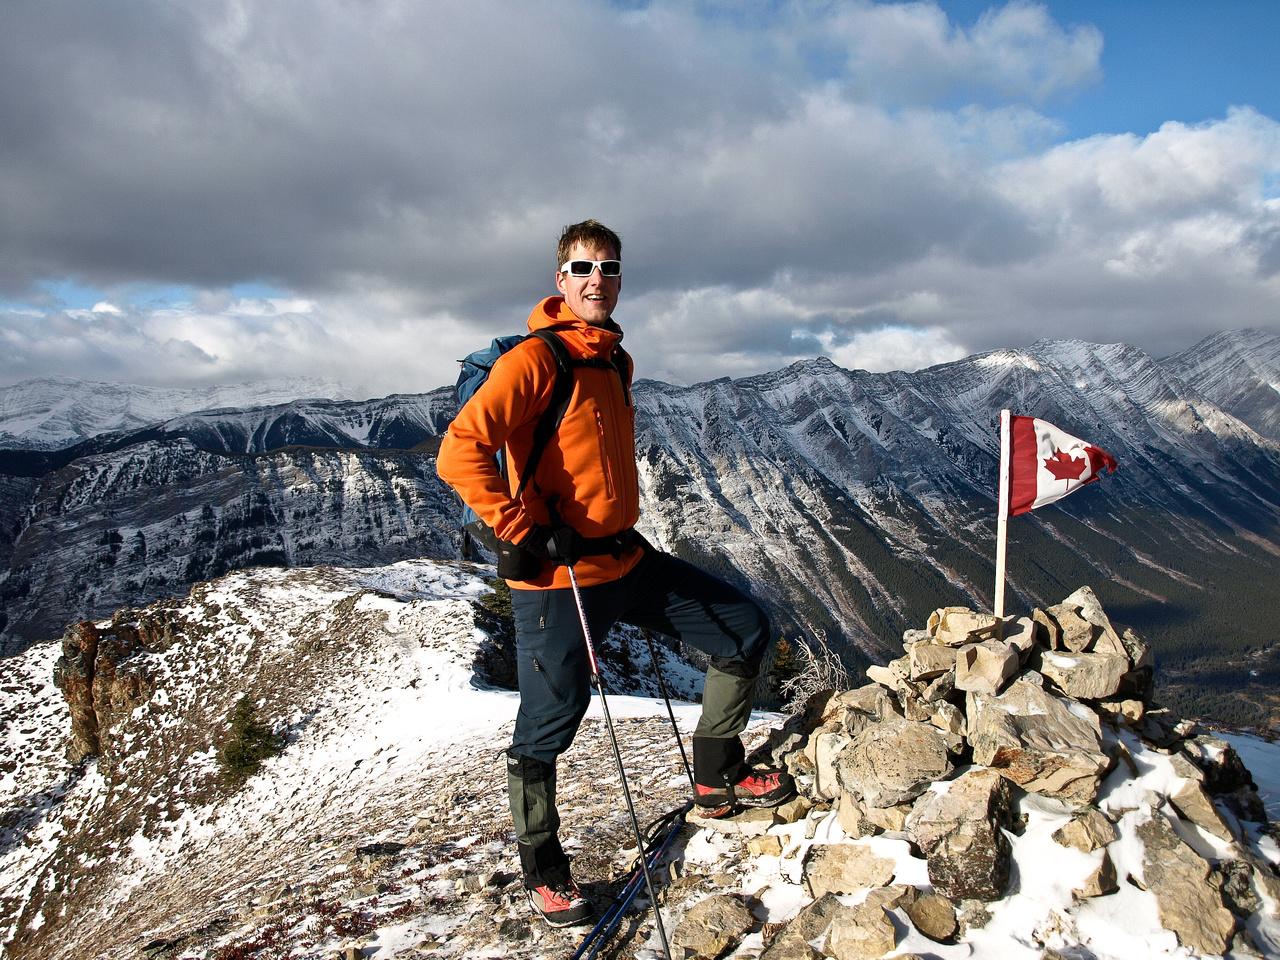 Vern on the Summit of King Creek Ridge.